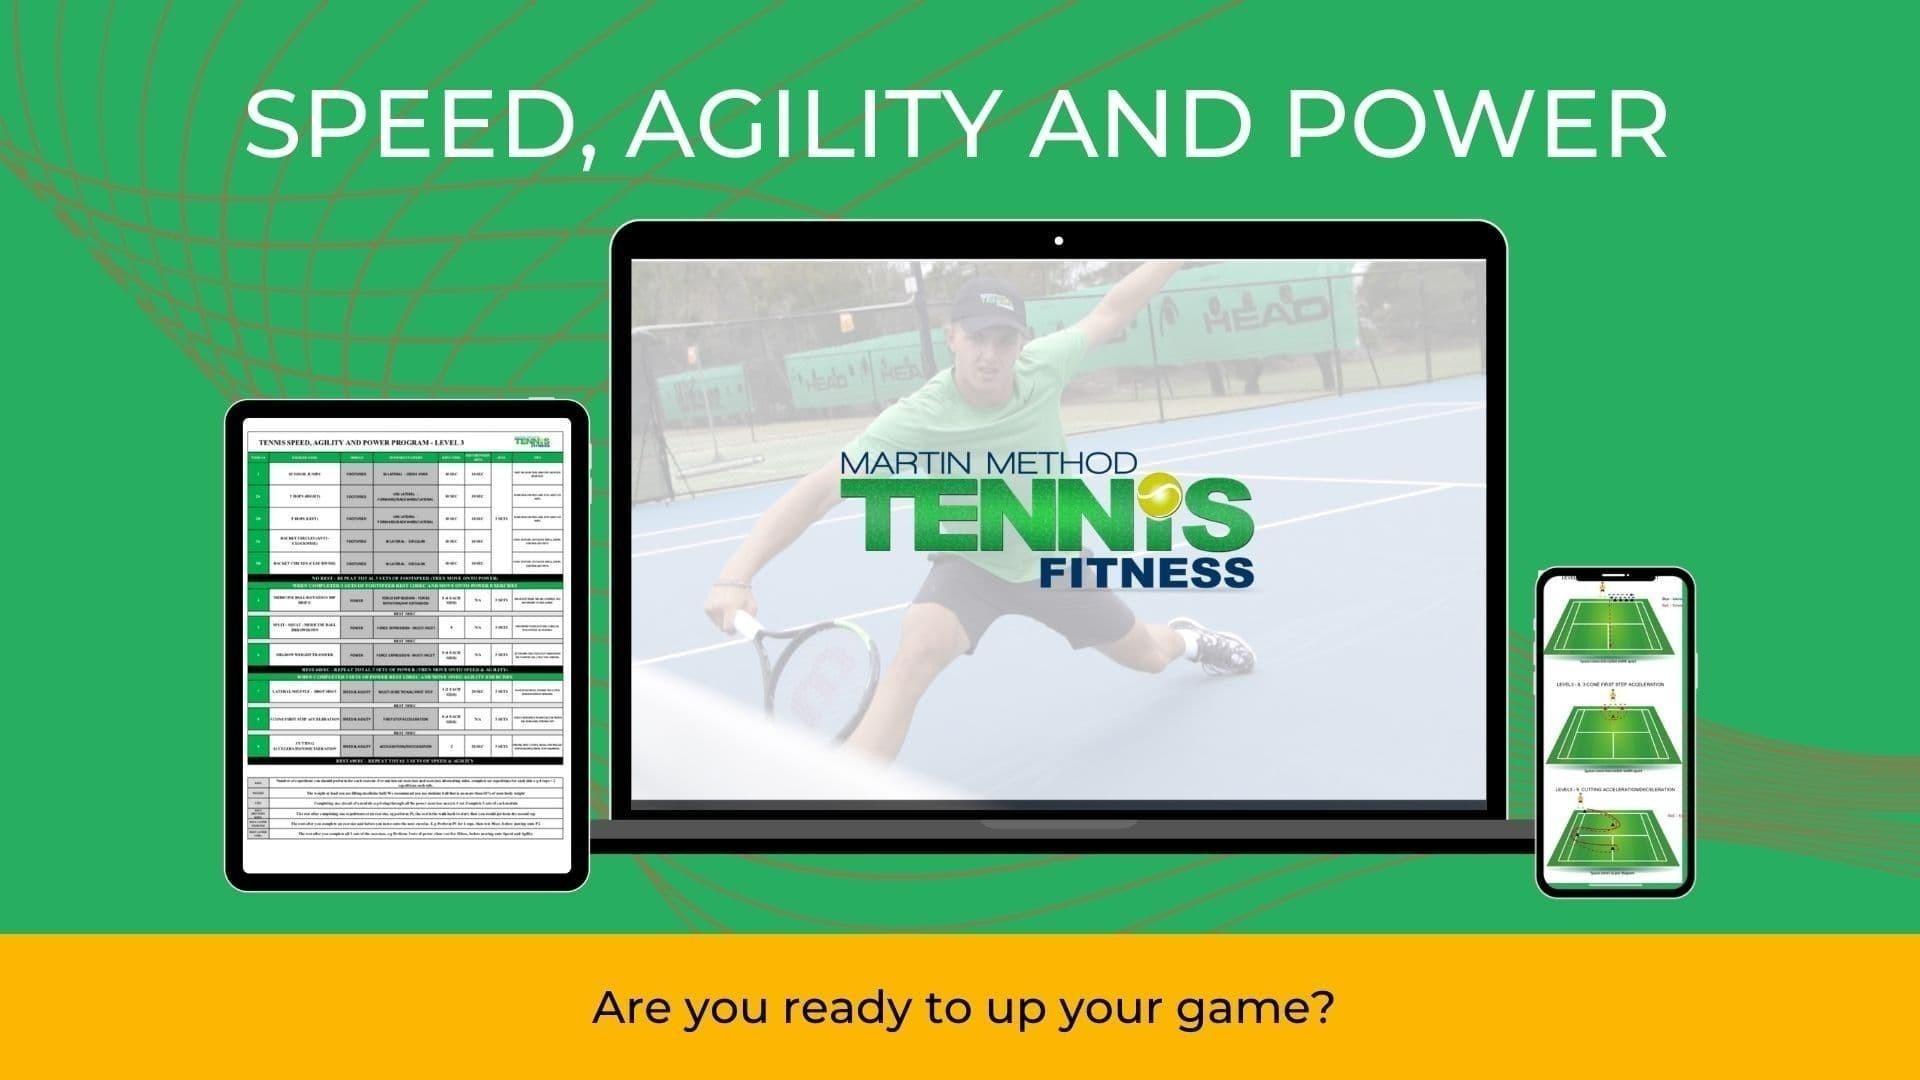 tennis-speed-agility-power-program-3